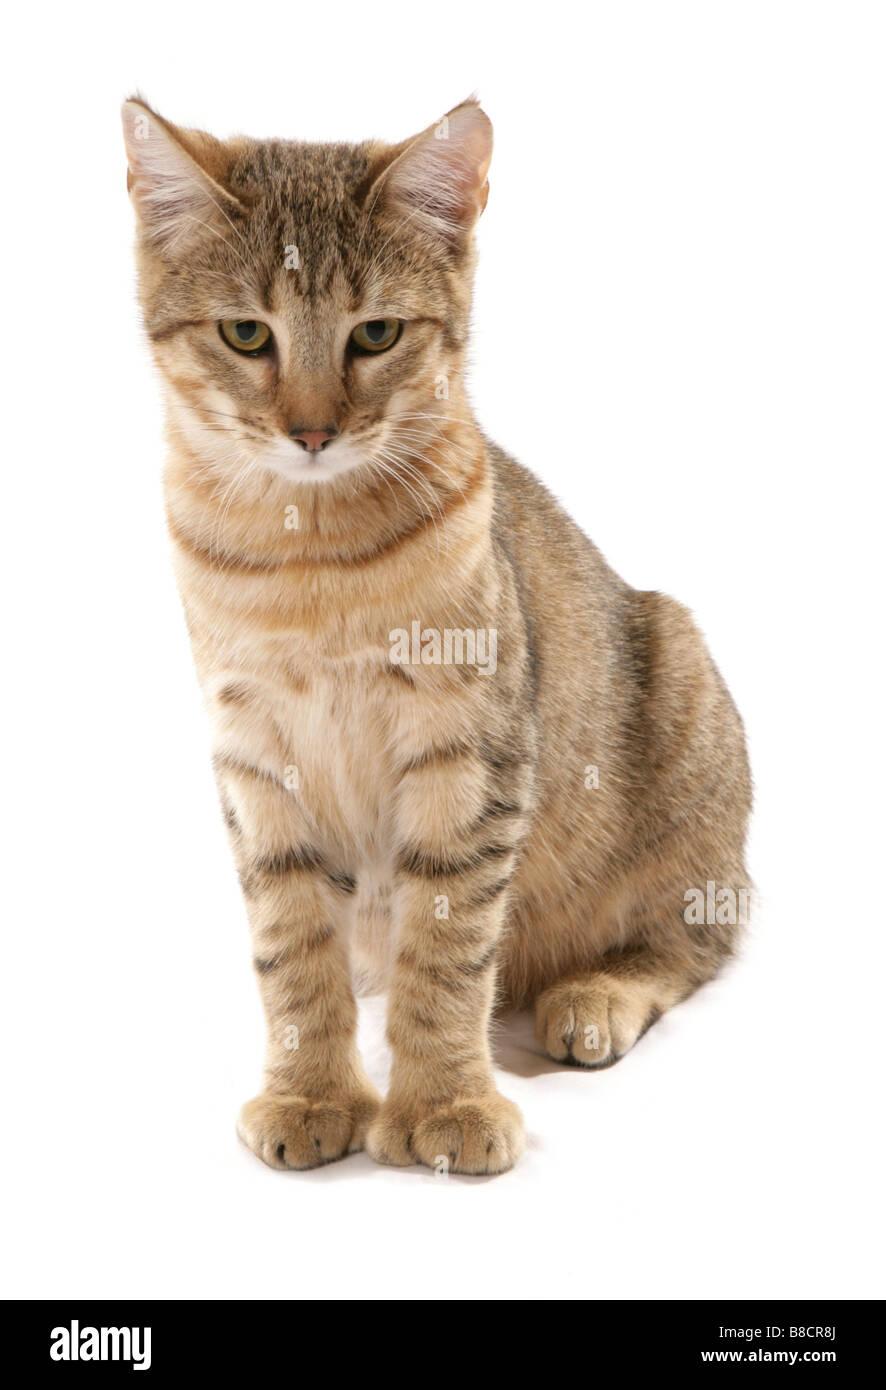 pixie bob cat sitting studio Stock Photo: 22409314 - Alamy